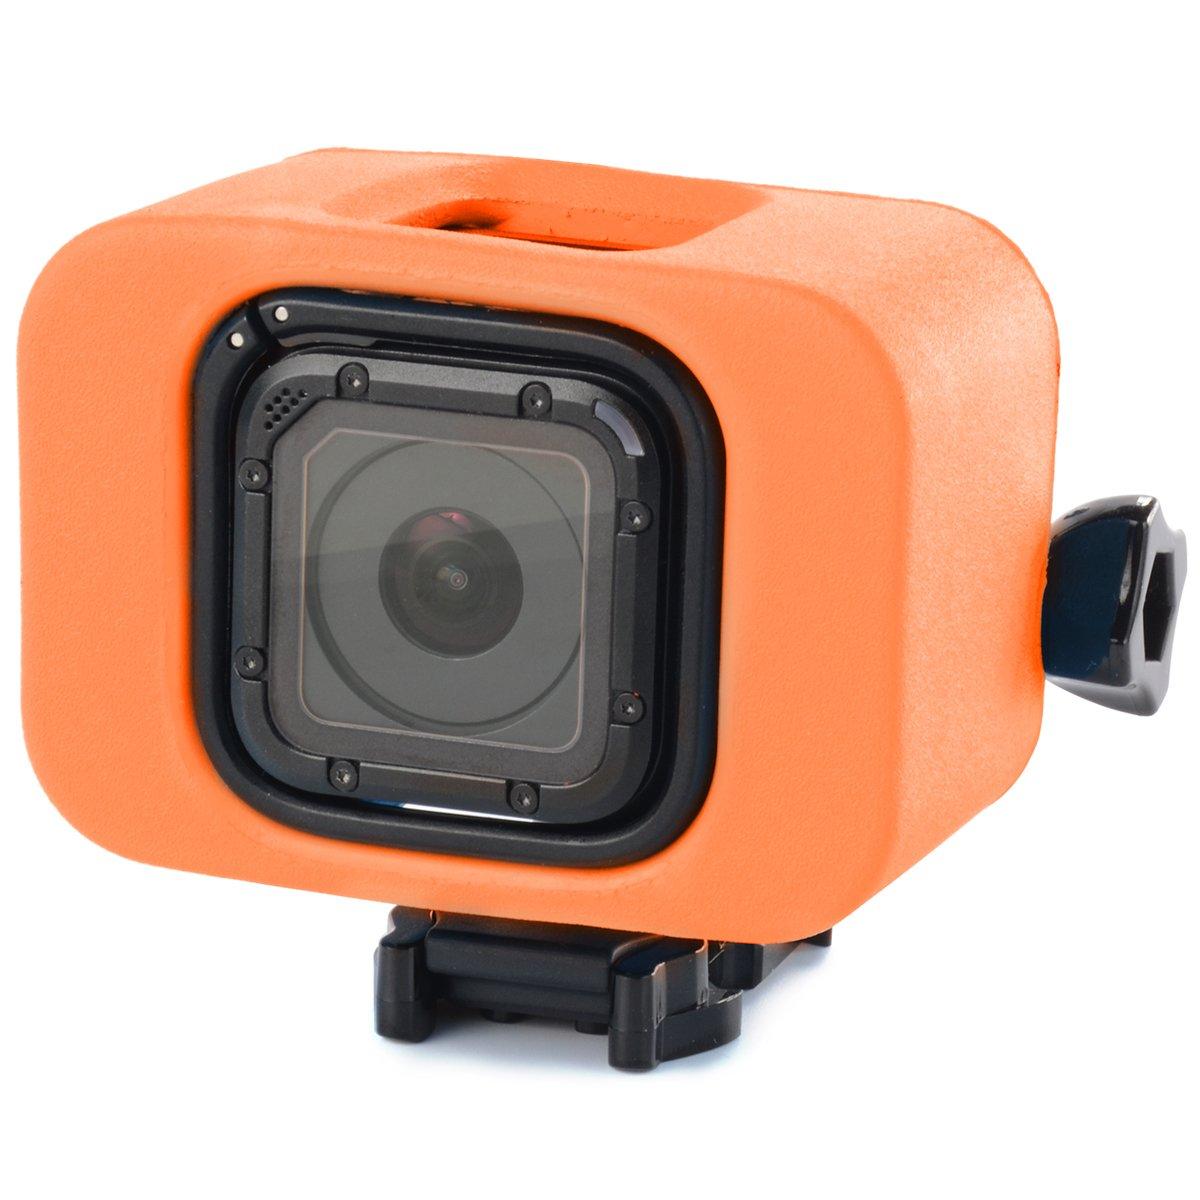 maxpremier (TM) agua flotador flotador Surf funda protectora para GoPro Hero 4 Sesión Cam OS455: Amazon.es: Electrónica